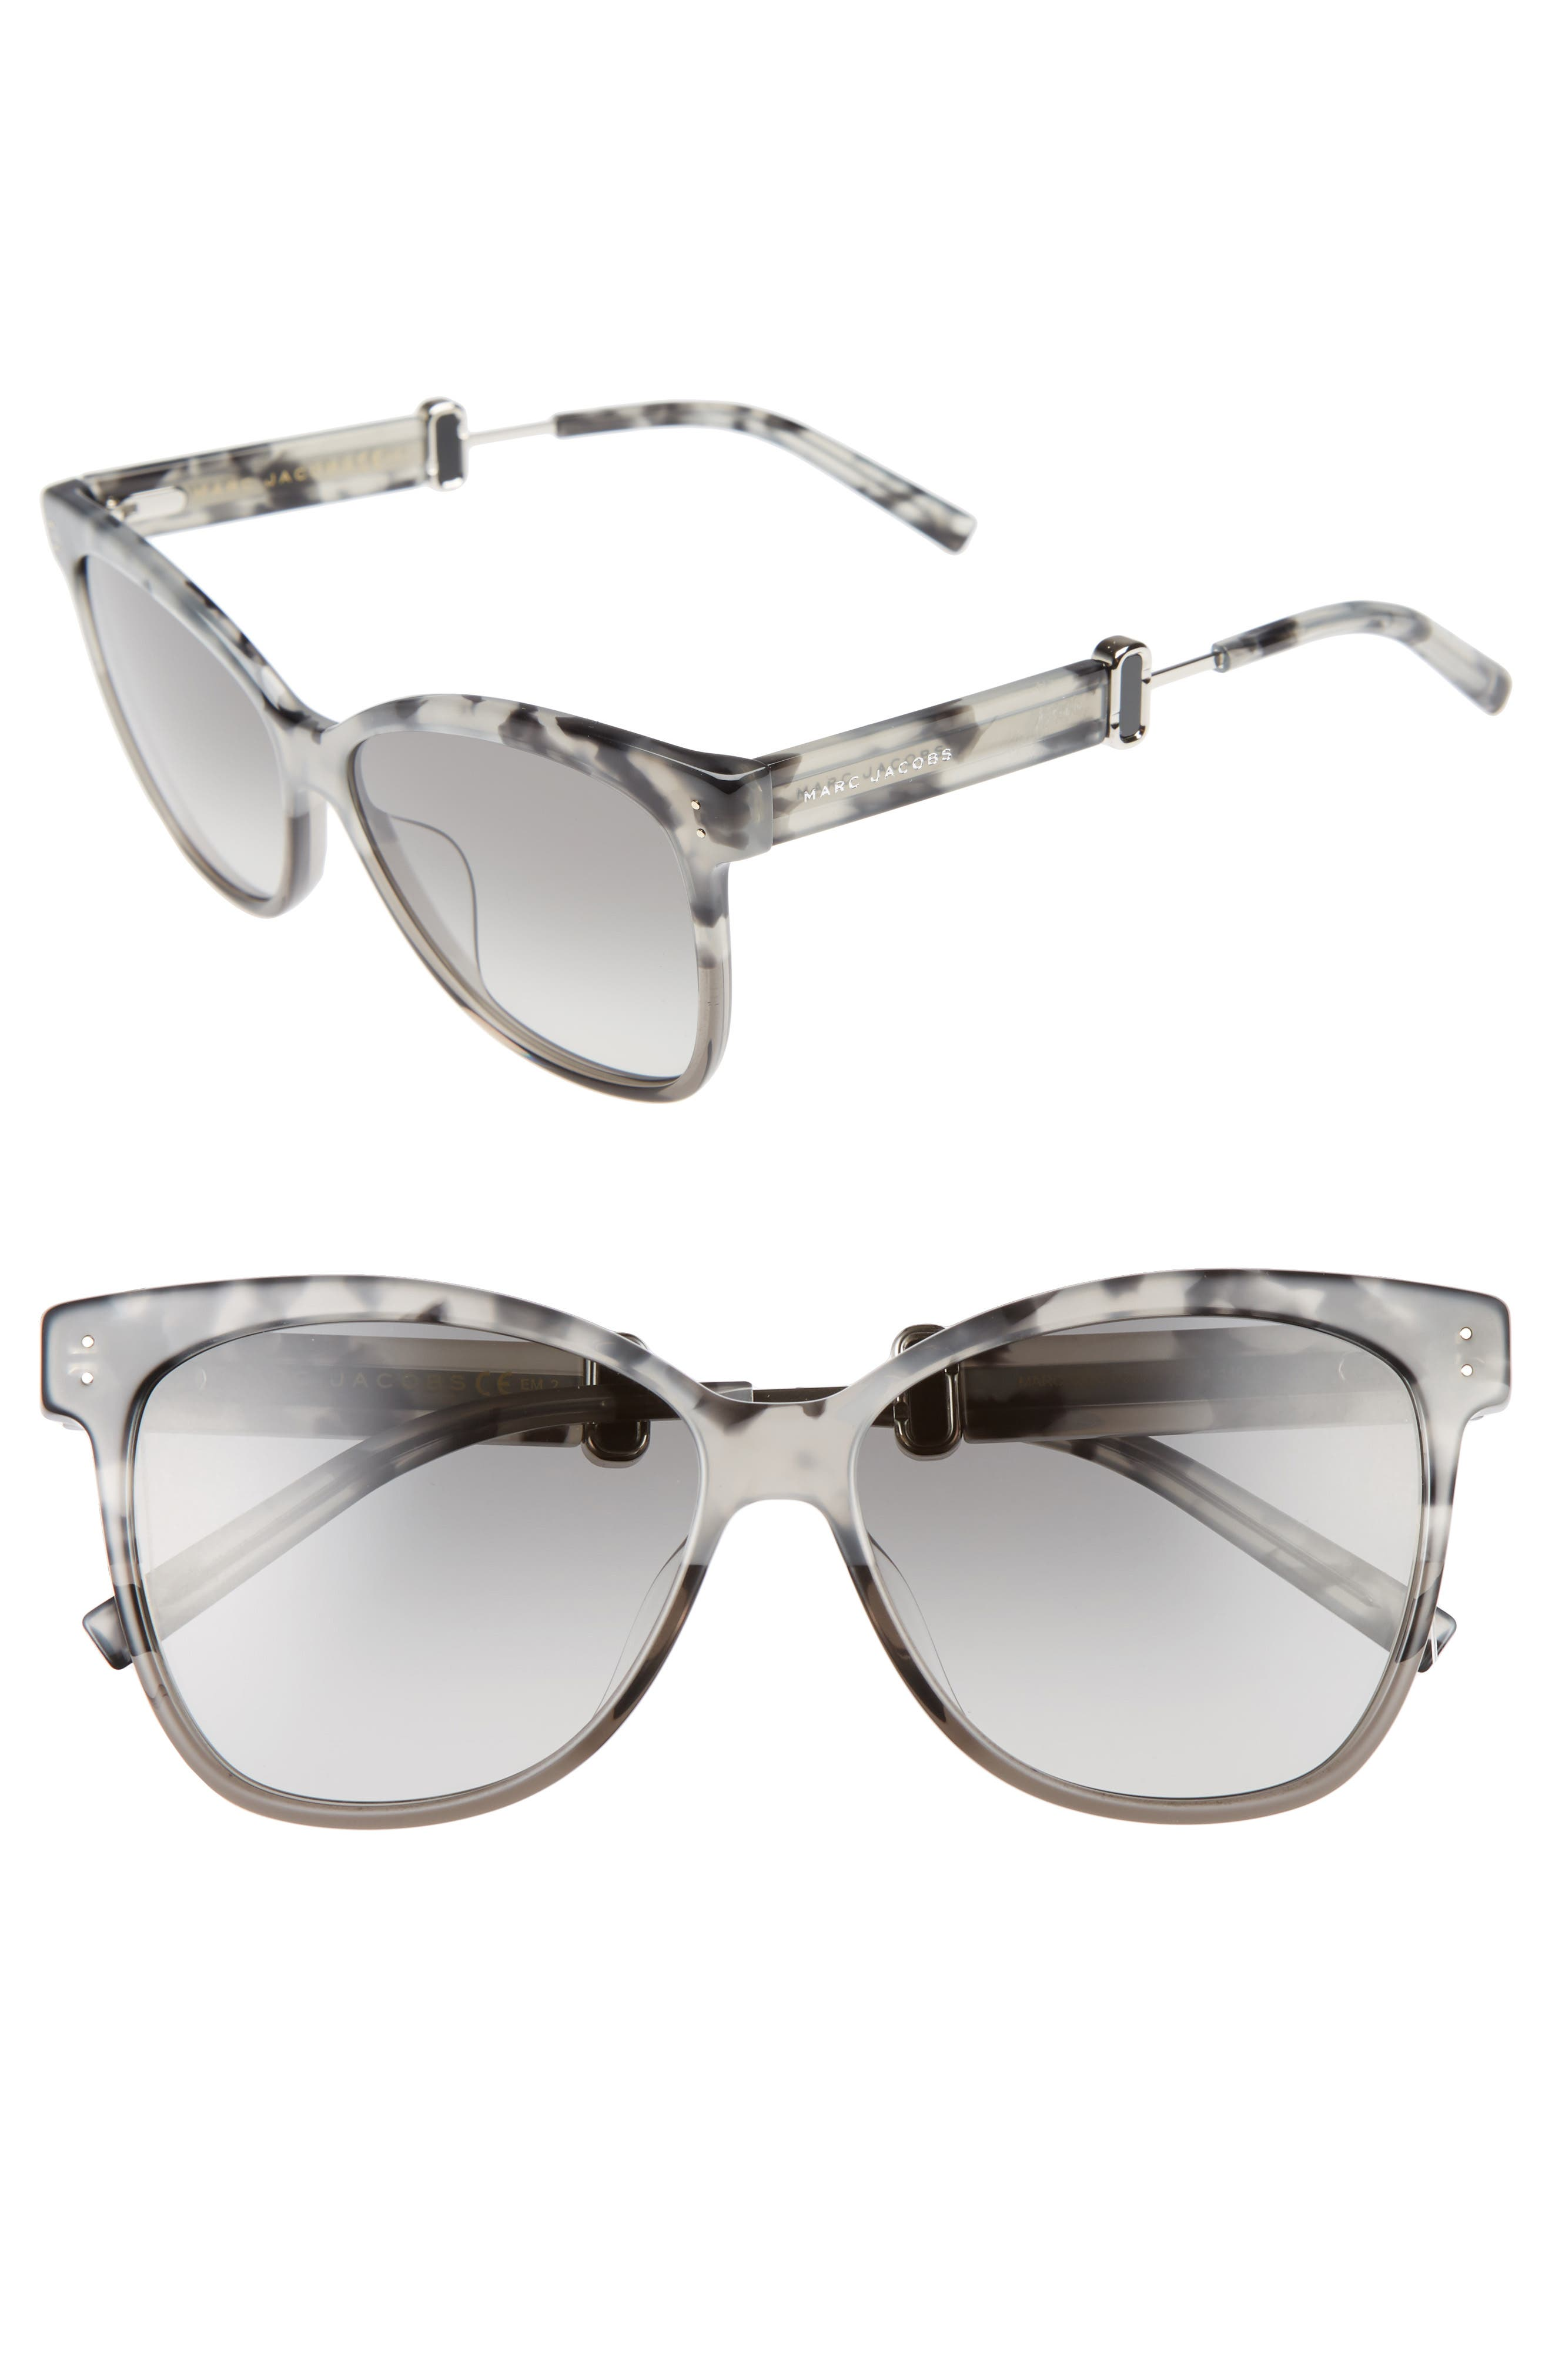 55mm Sunglasses,                             Main thumbnail 2, color,